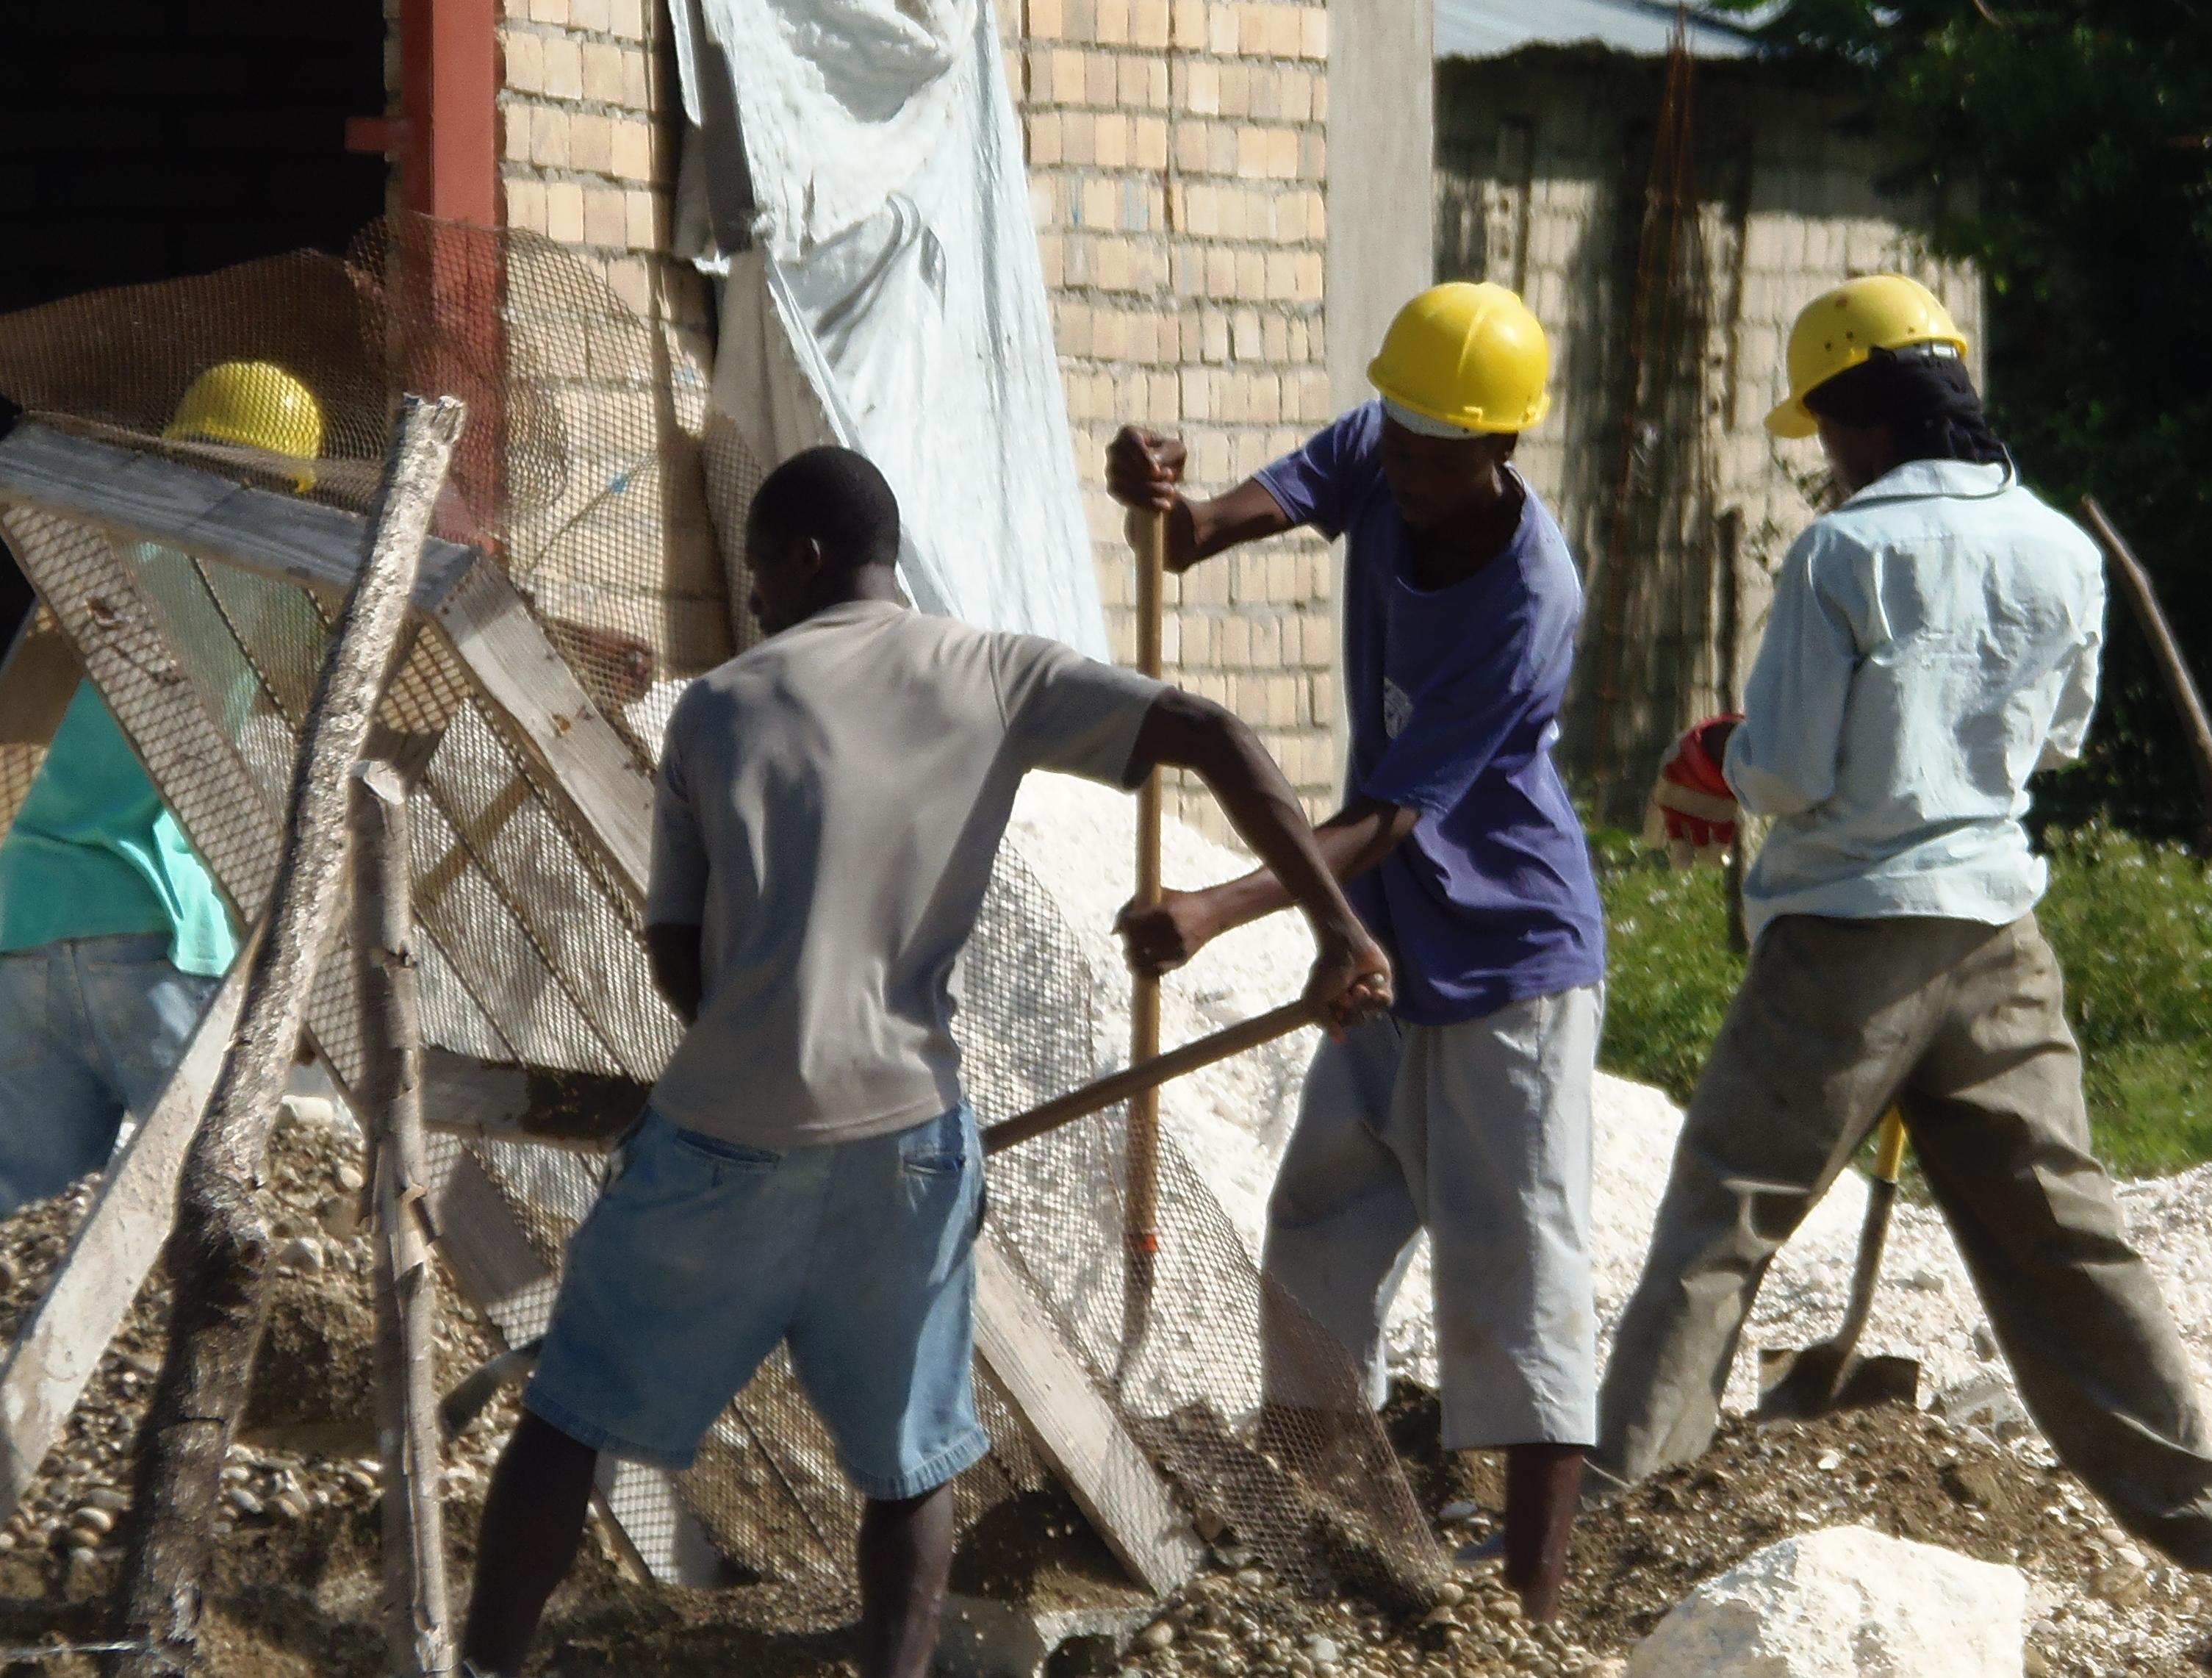 Building Jobs In Haiti With Blocks